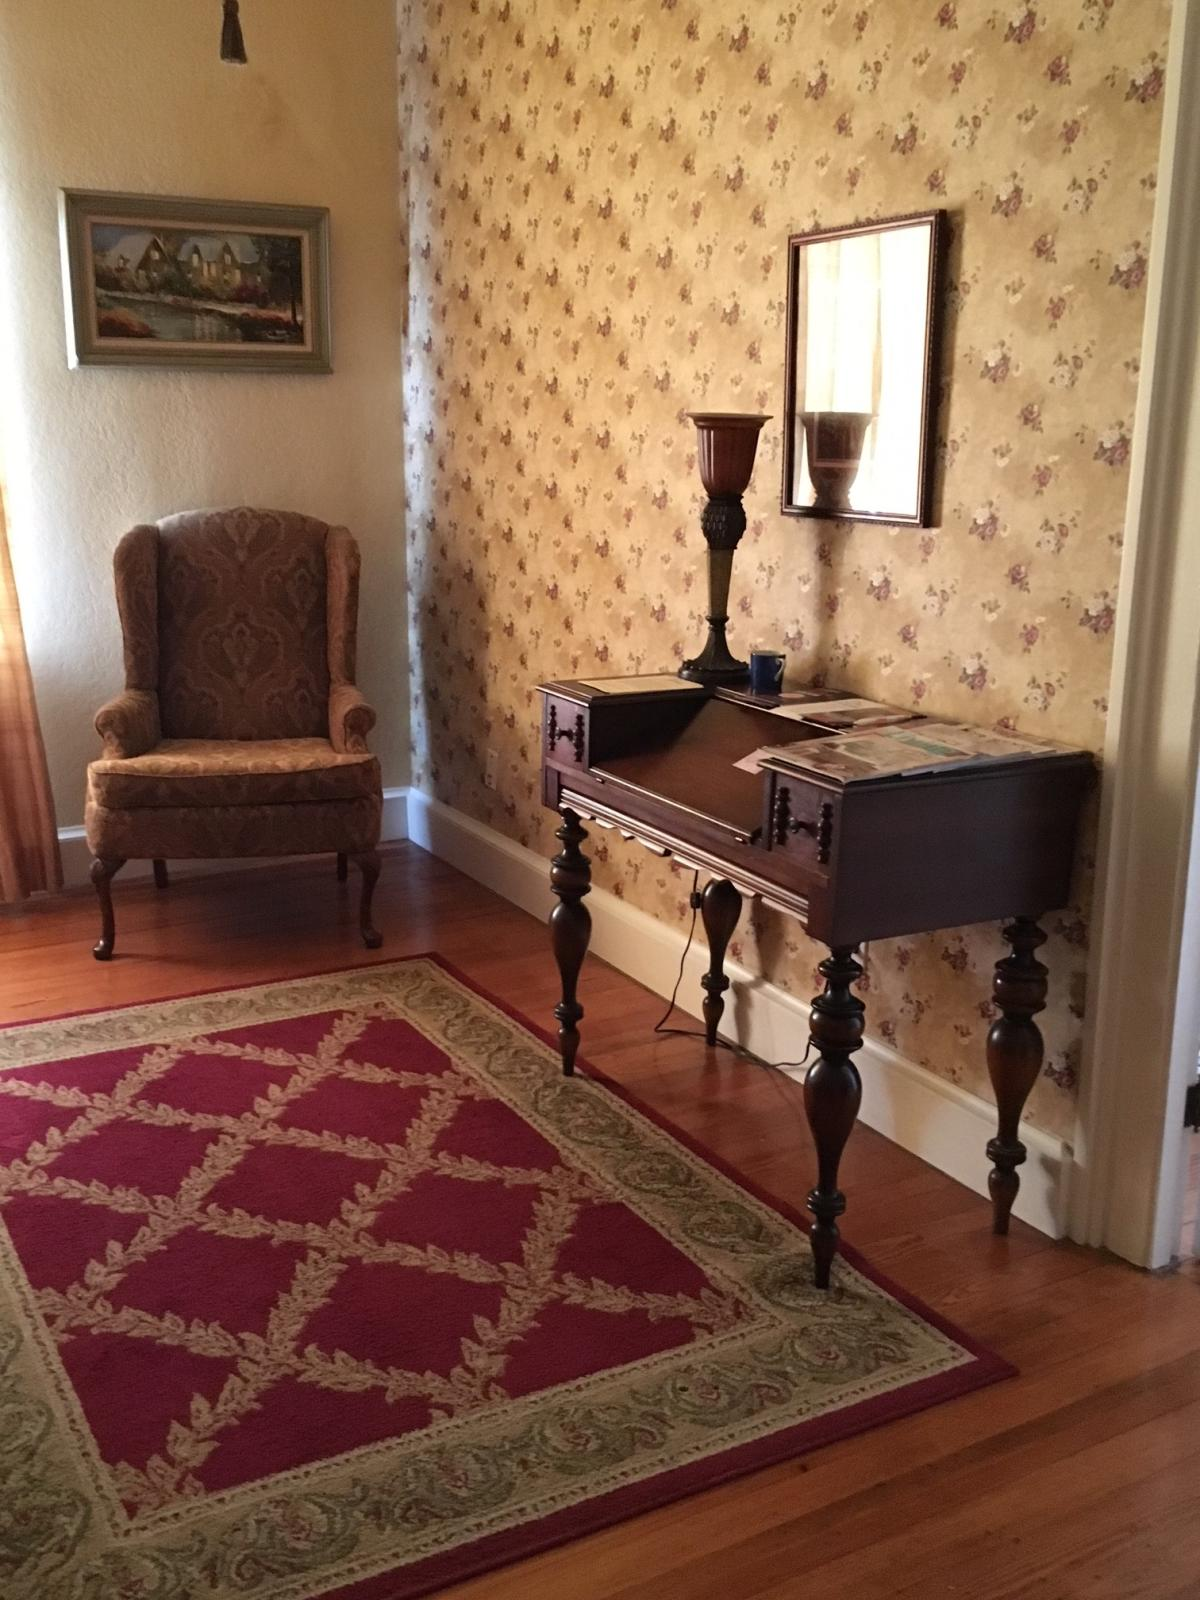 Free Virtual Room Layout Planner: General Granbury's Suites